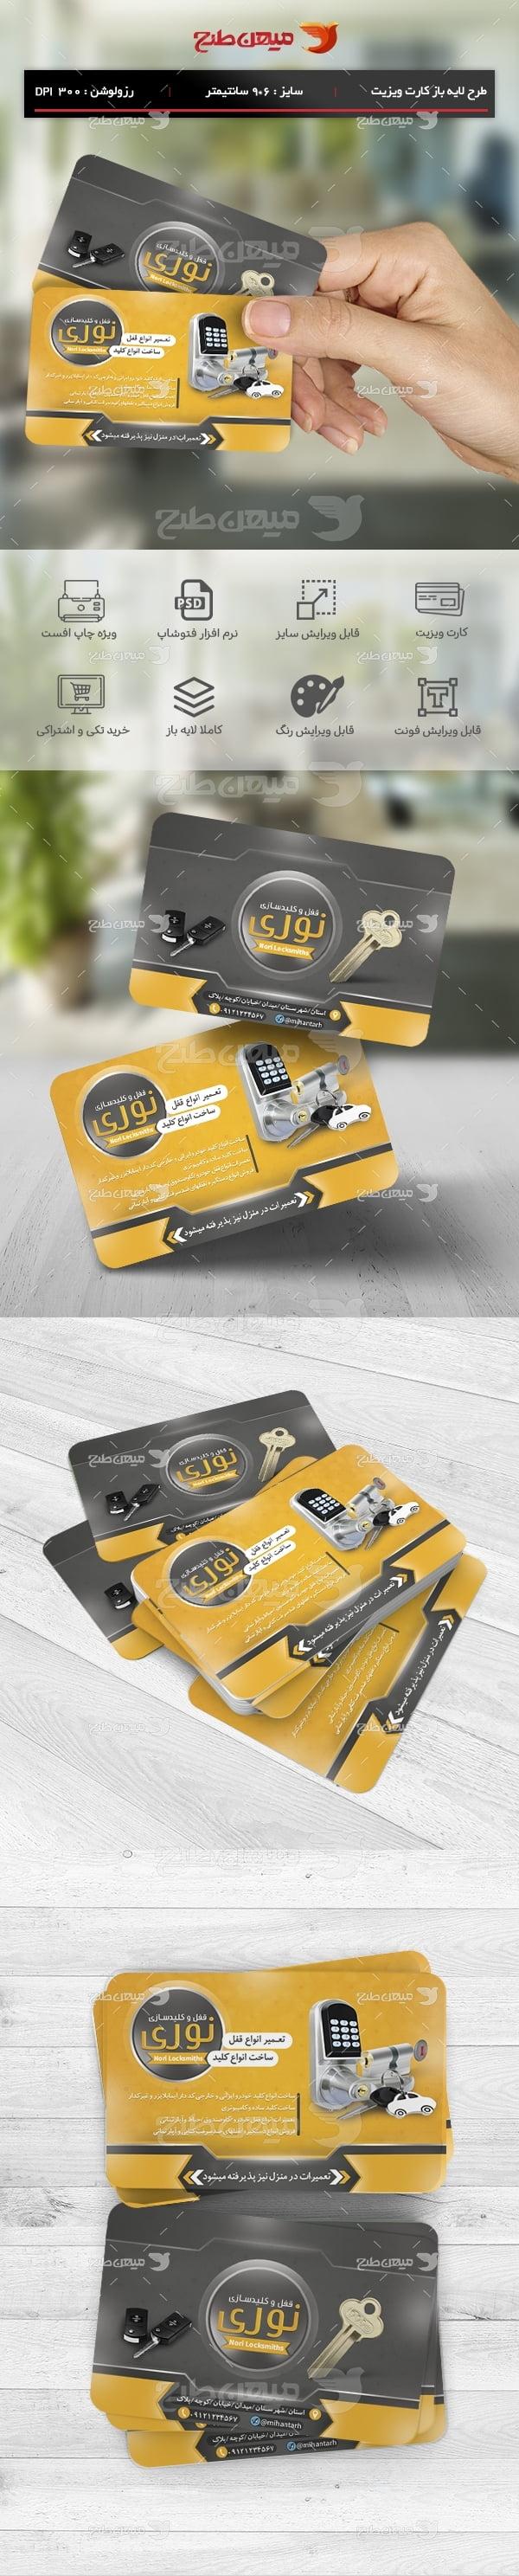 طرح لایه باز کارت ویزیت قفل و کلید سازی